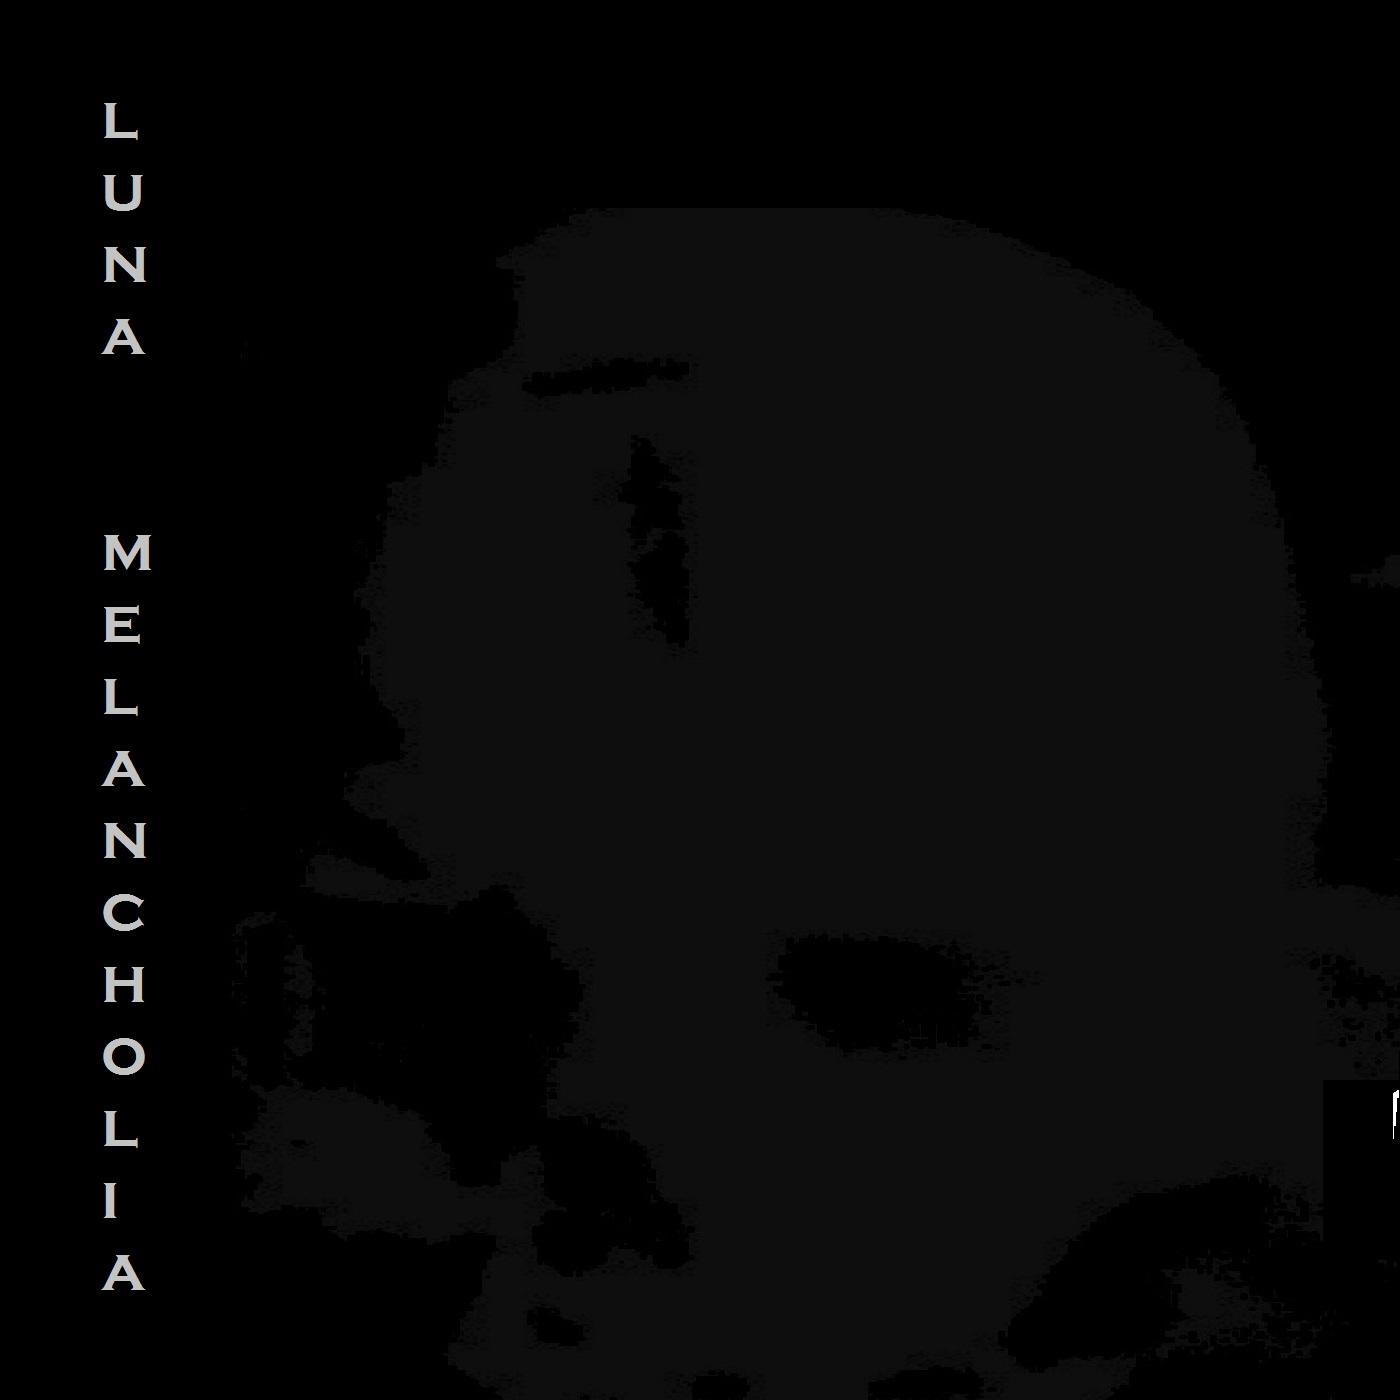 LUNA MELANCHOLIA